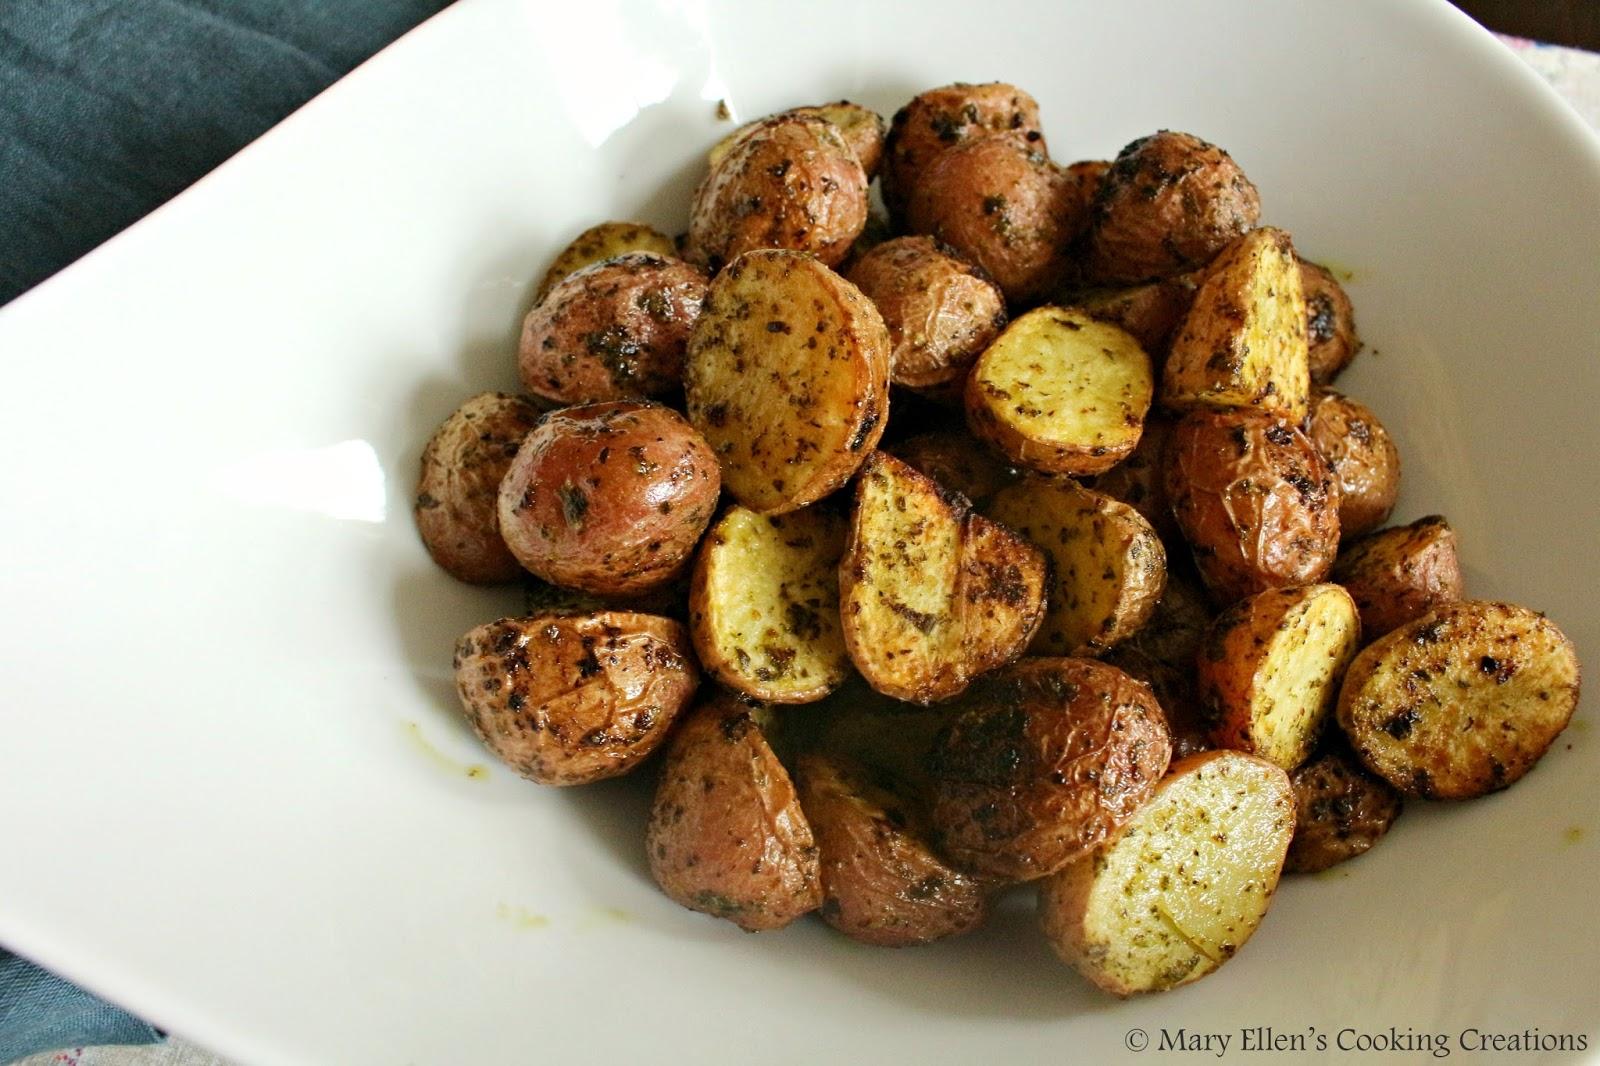 Mary Ellen S Cooking Creations Lemon Garlic Roasted Potatoes